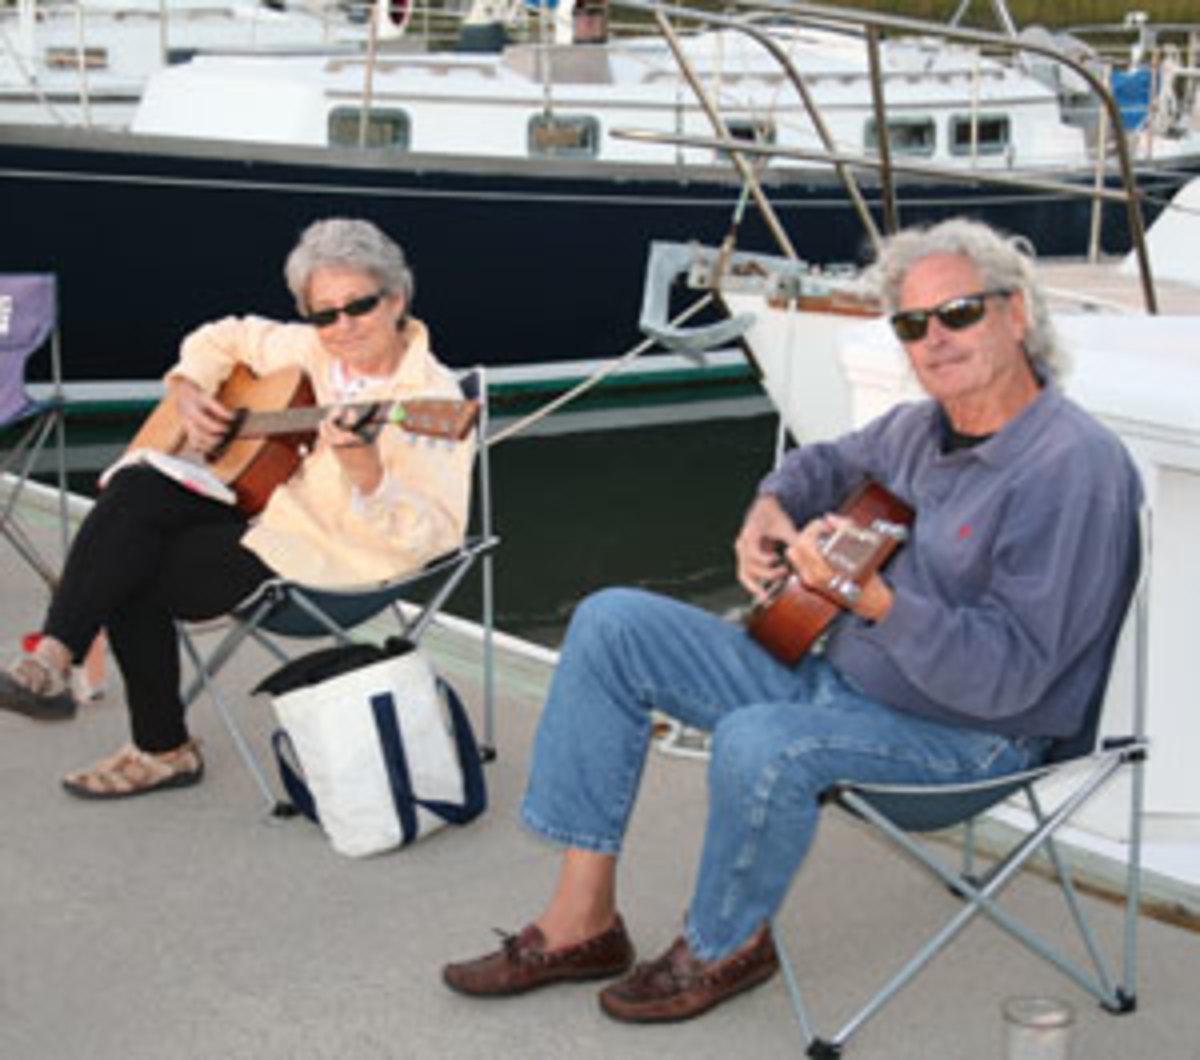 Guitar players on Jekyll Island